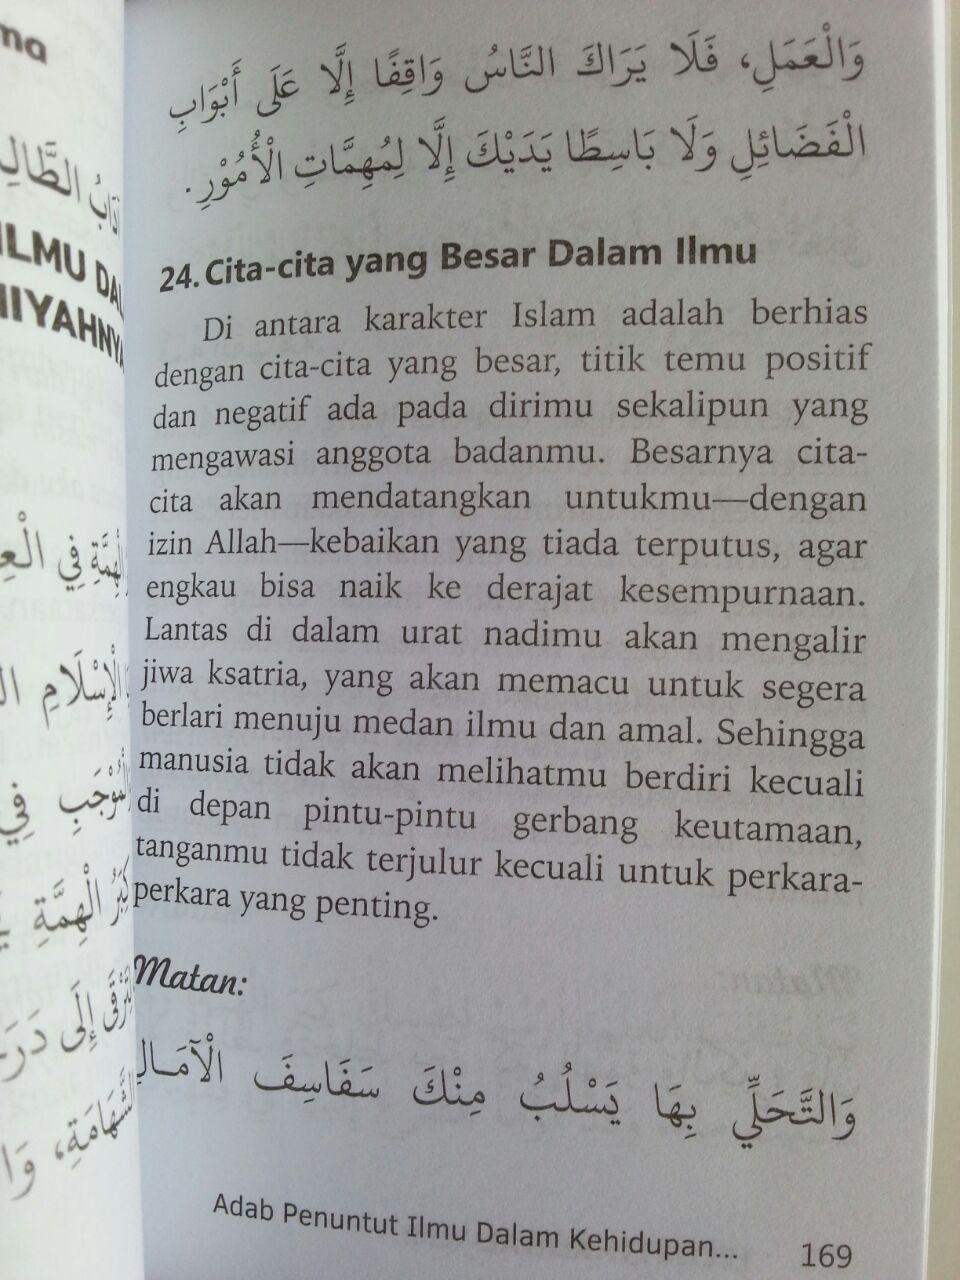 Buku Hilyah Thalib Al-Ilmi Pedoman Adab Akhlak Penuntut Ilmu isi 3